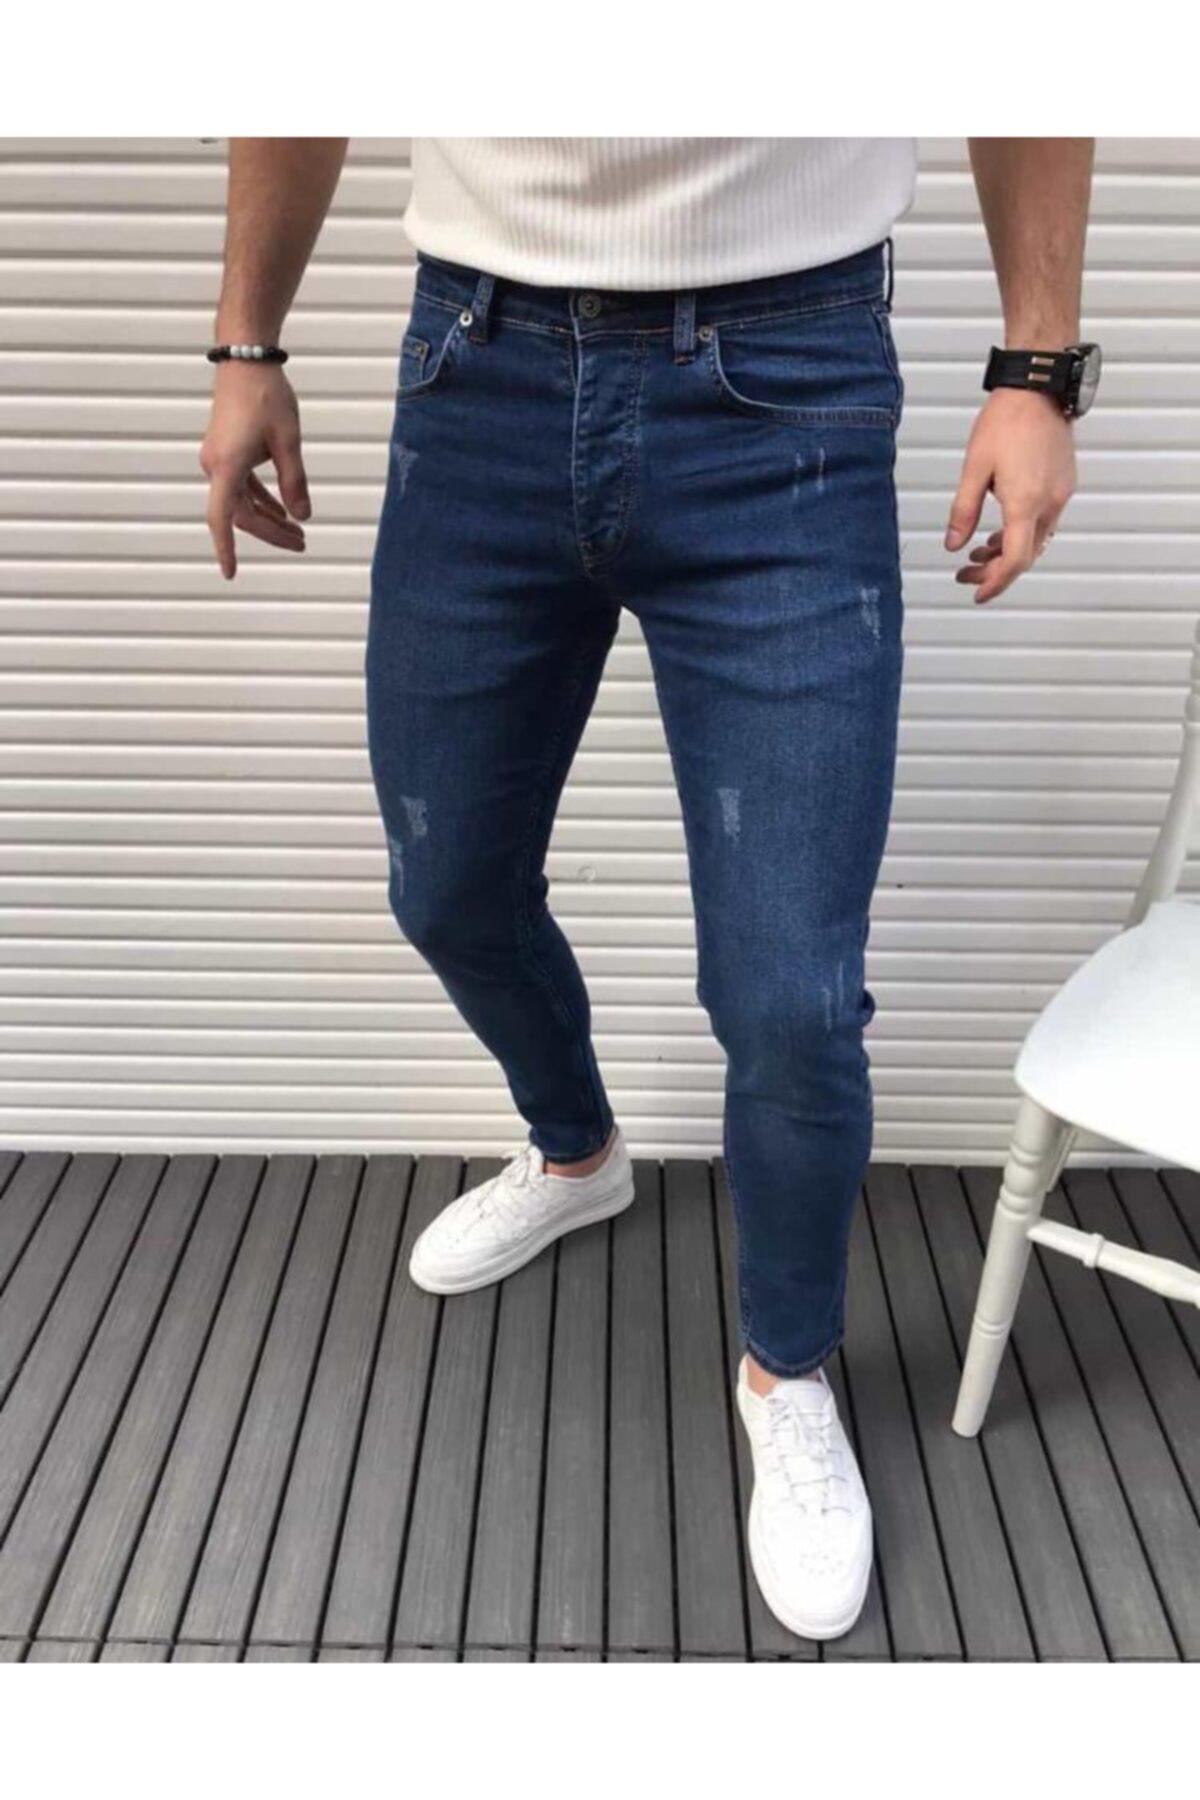 h&ç giyim Erkek Kot Pantolon Lacivert 1